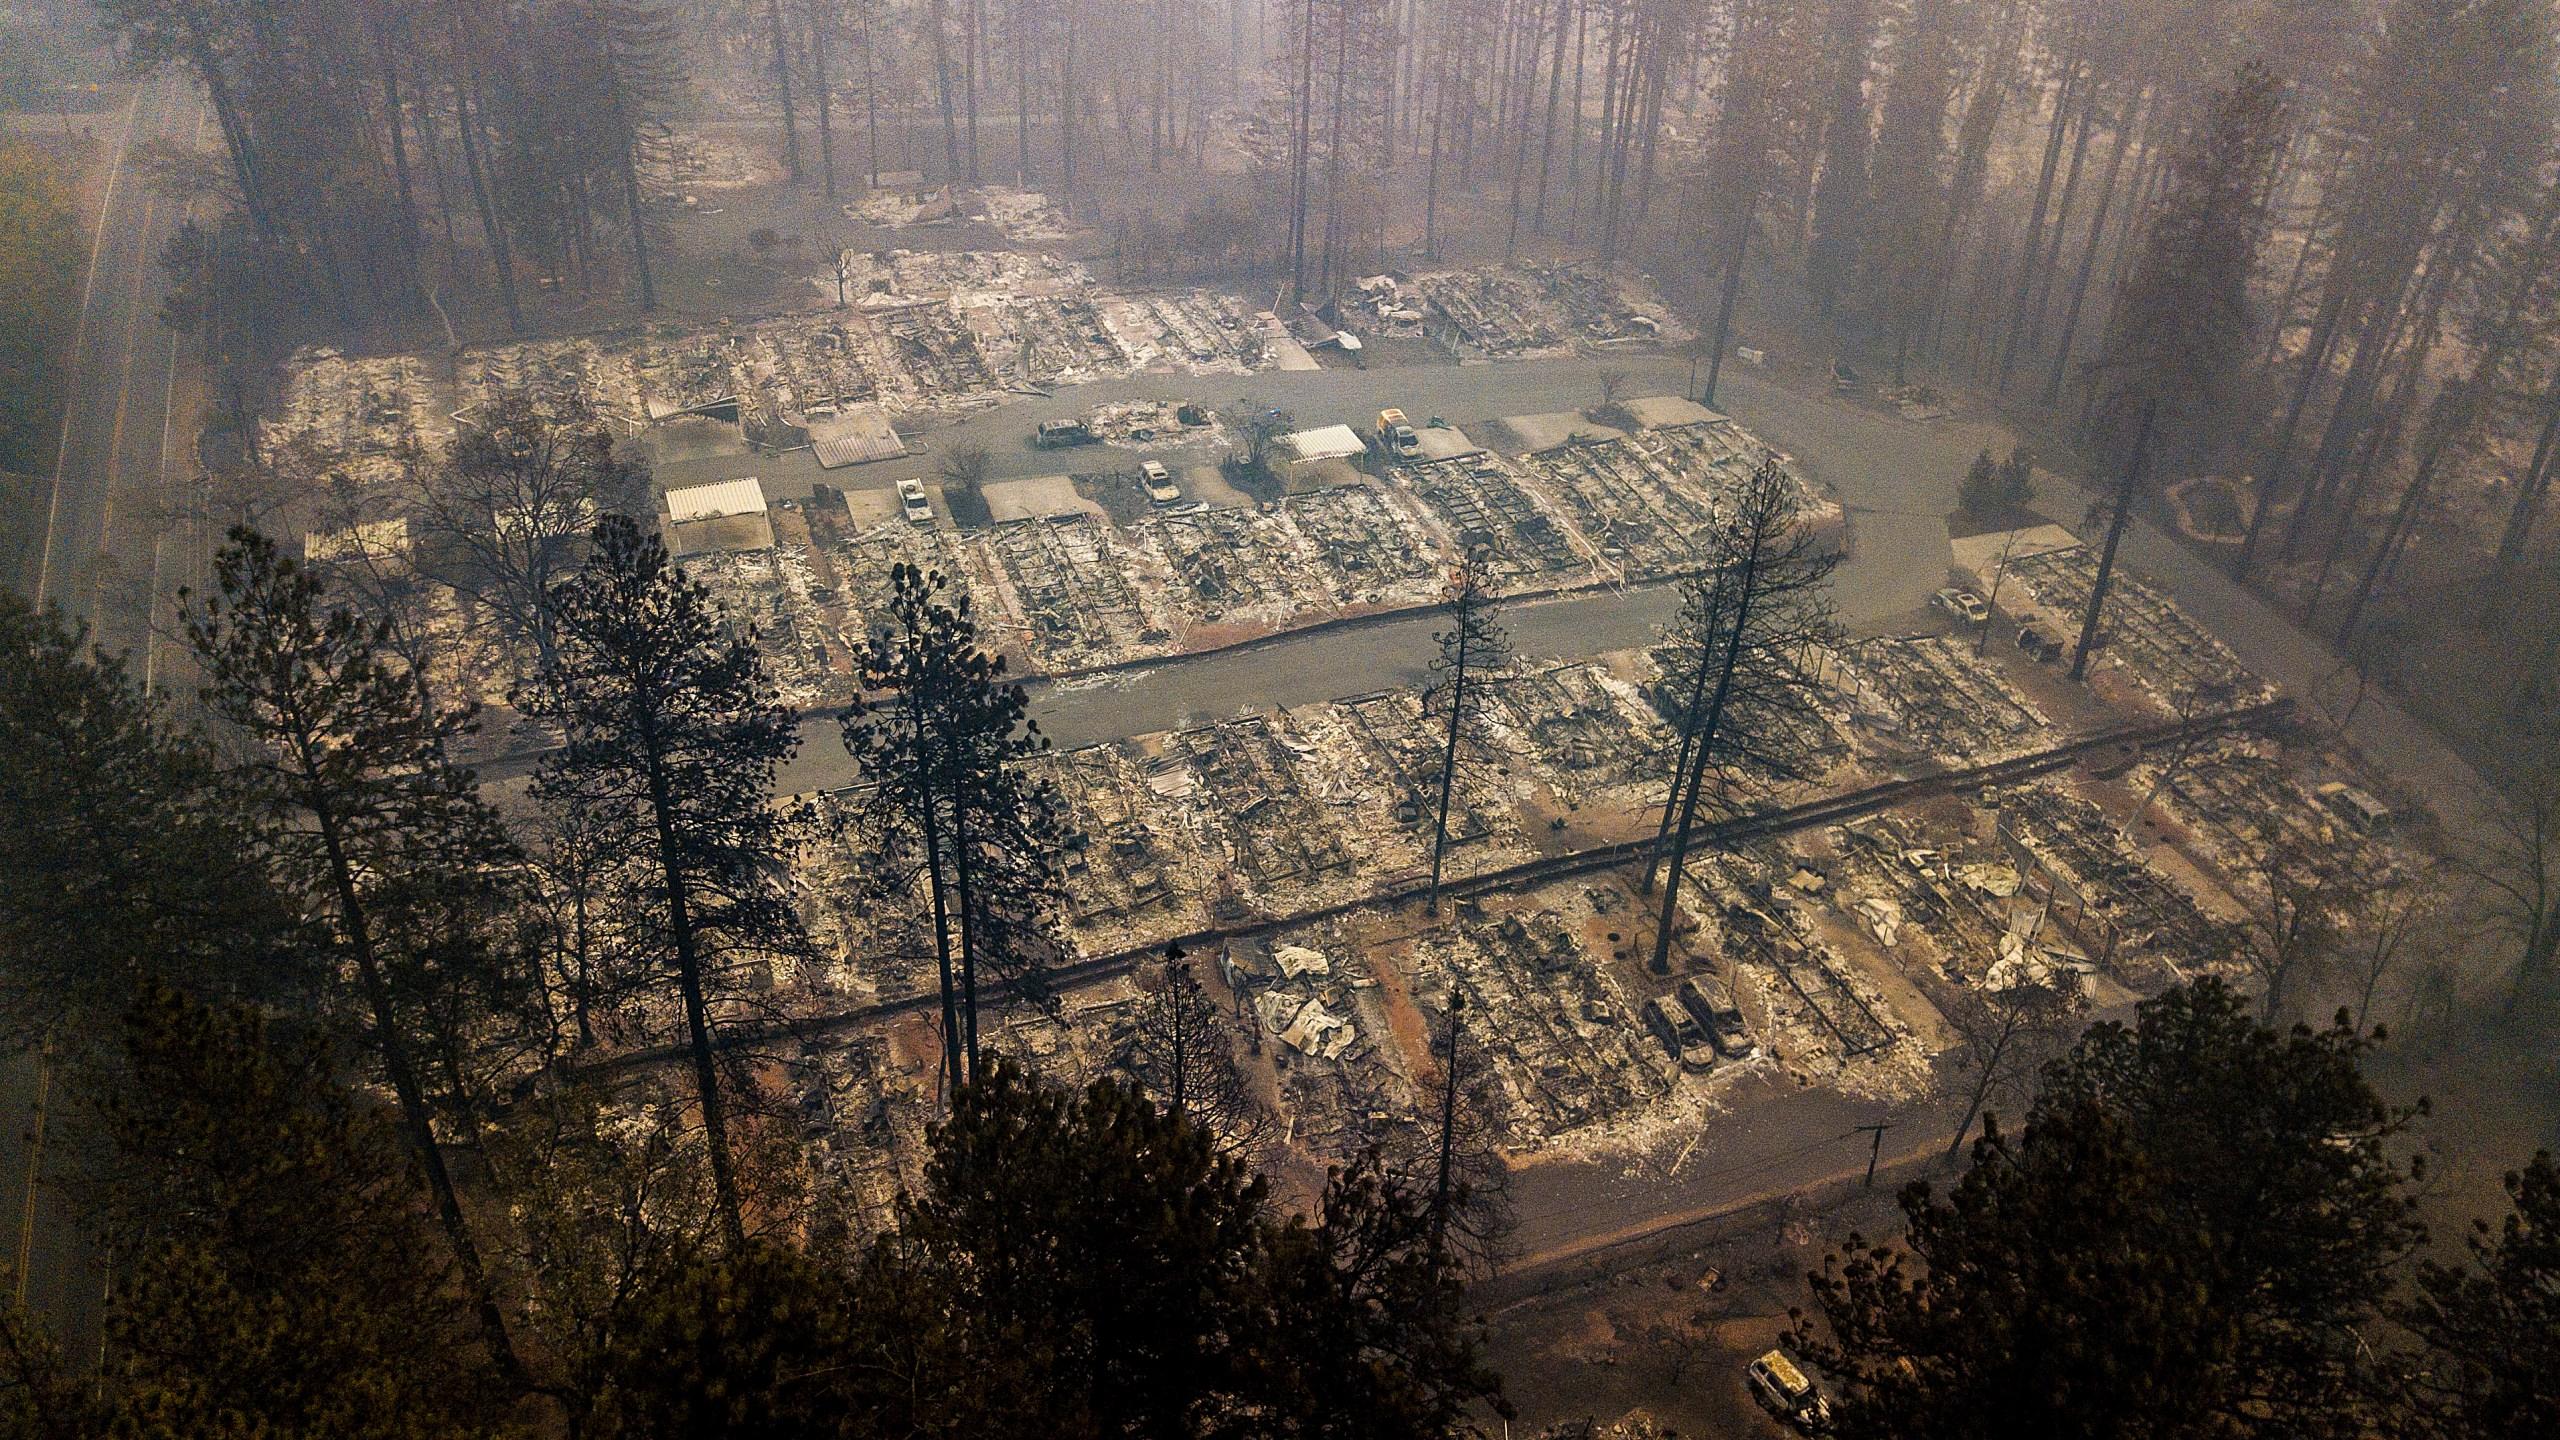 California_Wildfires_96778-159532.jpg37828276